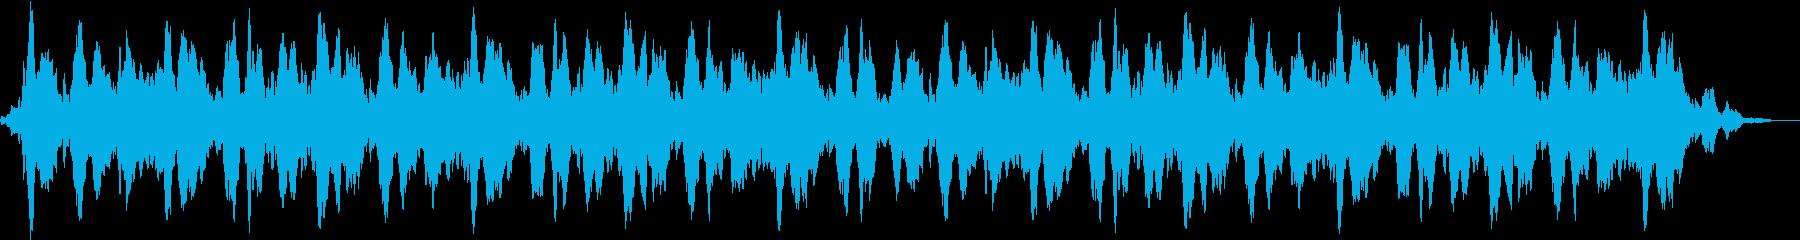 魔法詠唱、 魔法発動、 独白 03の再生済みの波形